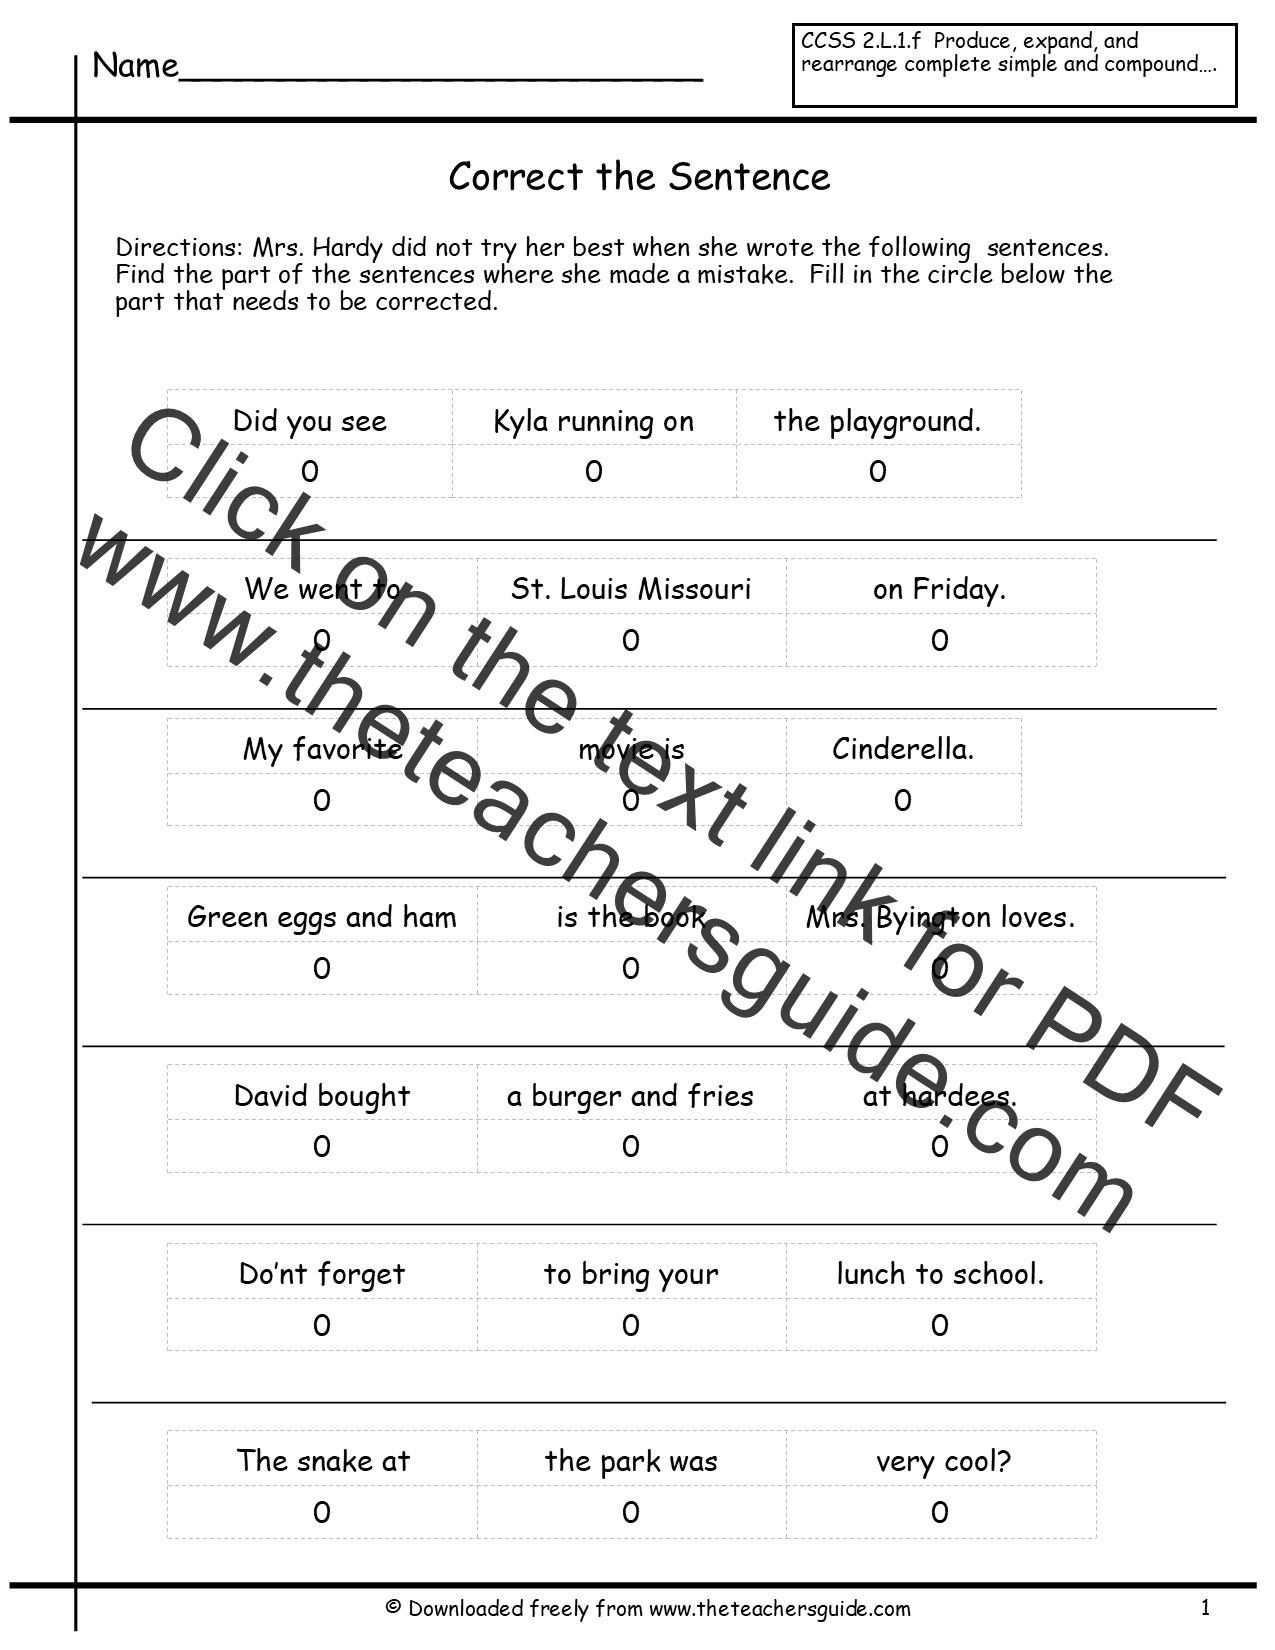 Sentences Worksheets From The Teacher's Guide